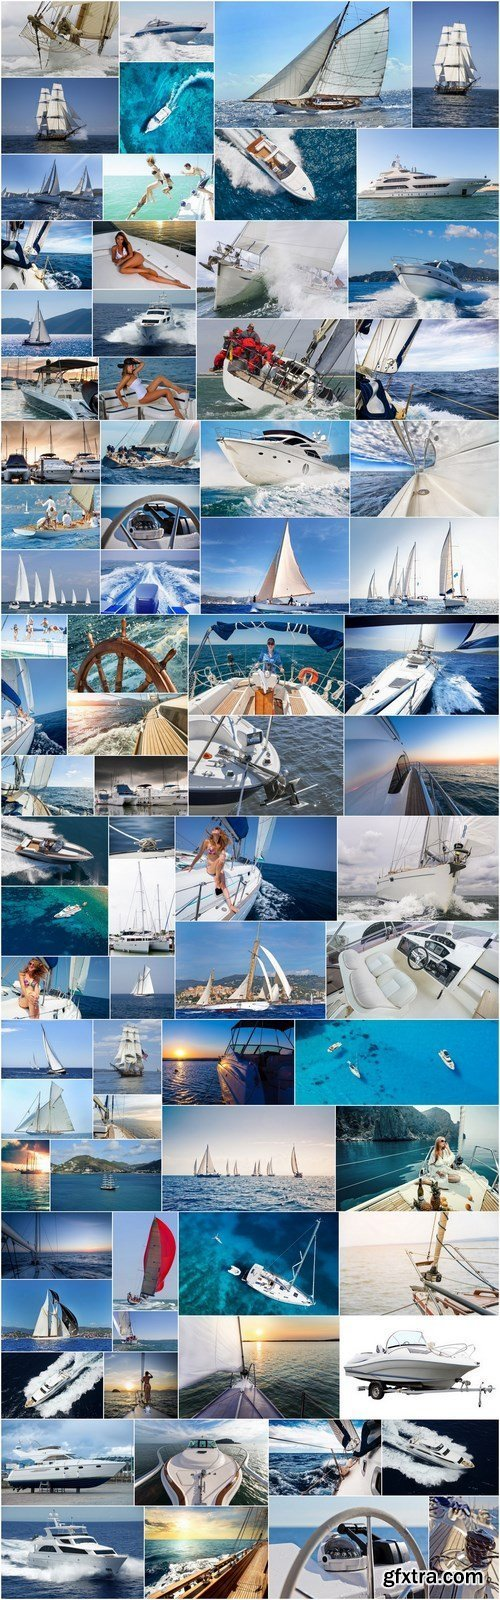 Yachts, Yachting, Regata and Sailing - Set of 78xUHQ JPEG Professional Stock Images